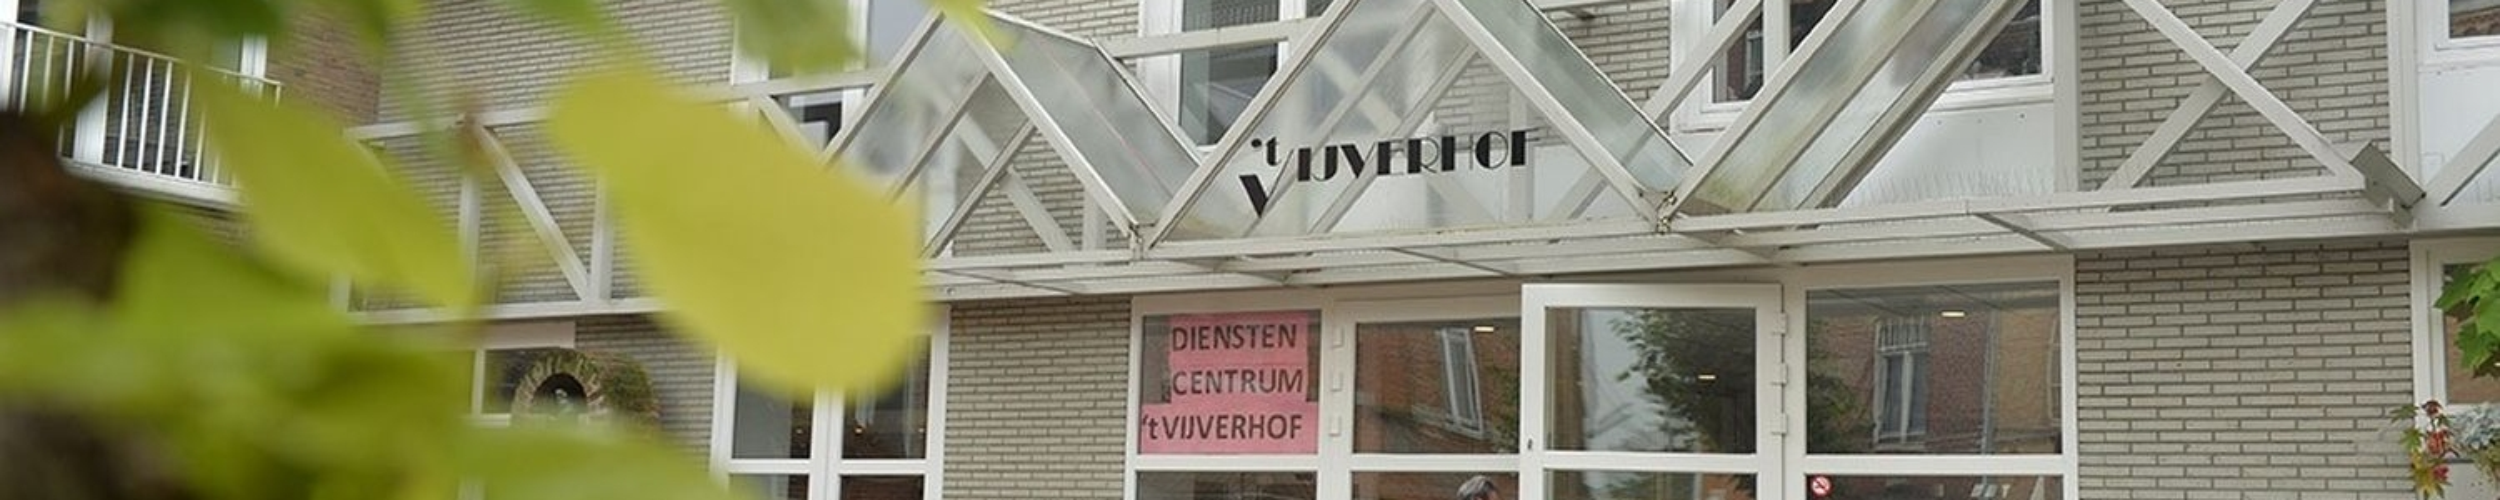 dienstencentrum 't Vijverhof